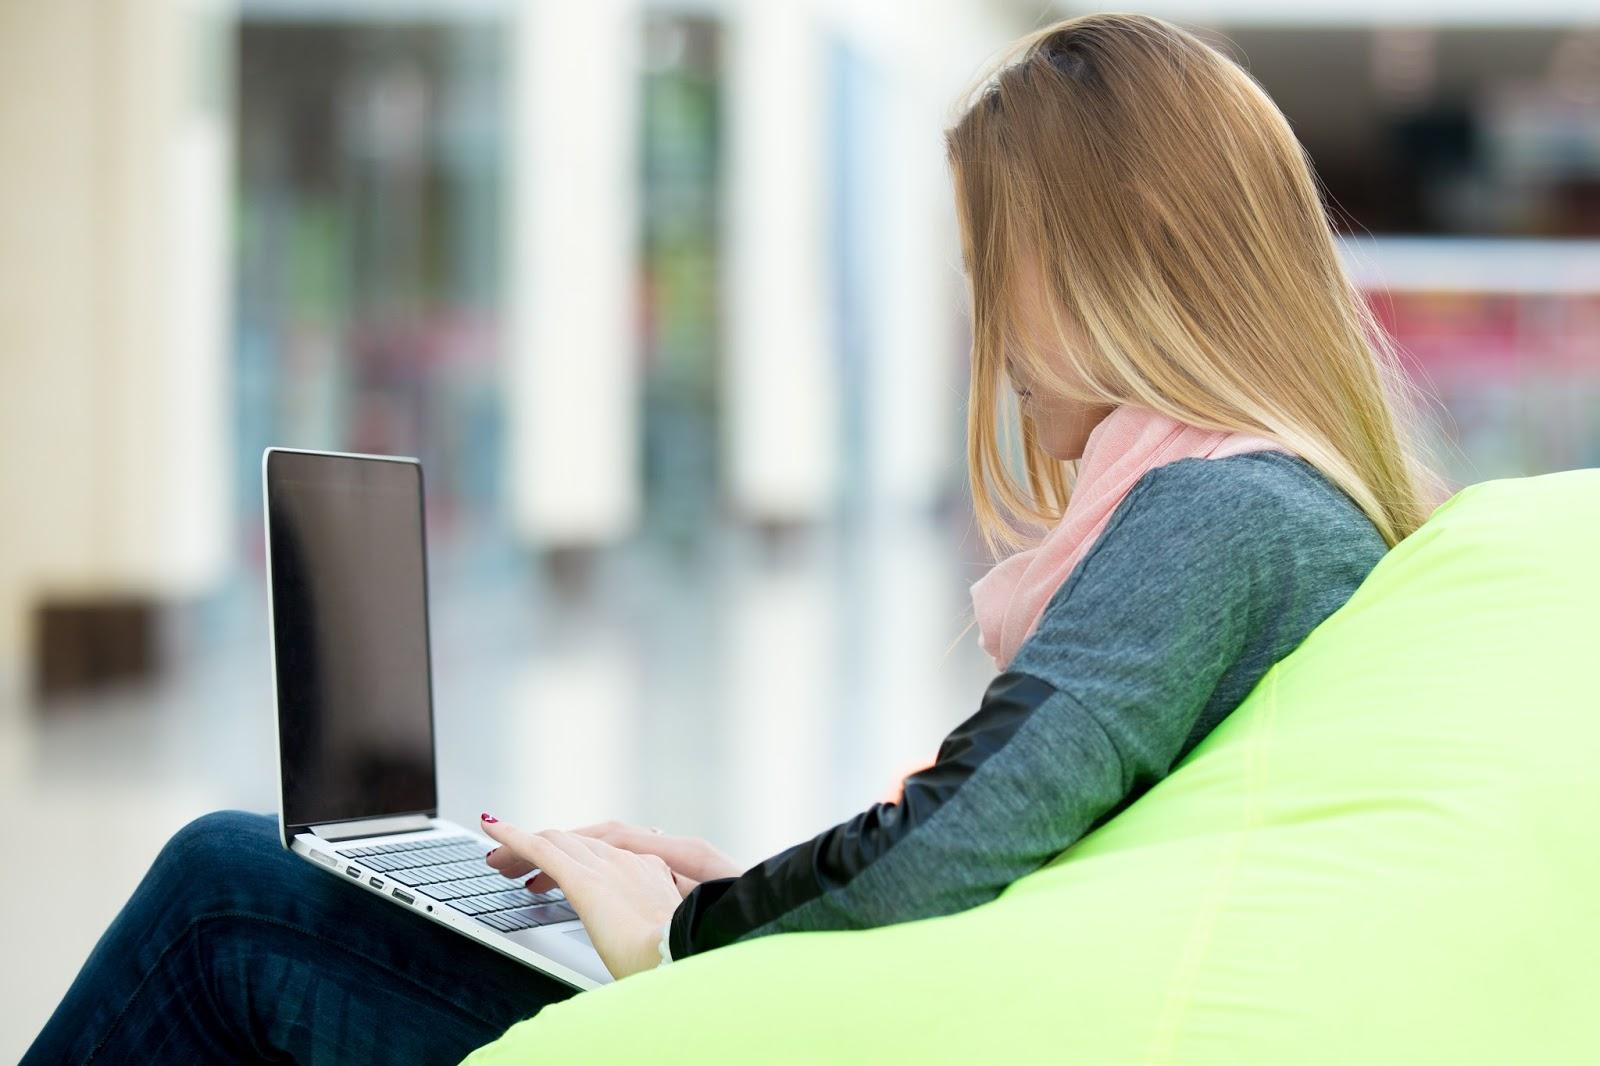 Cara Merawat Laptop Agar Tetap Awet